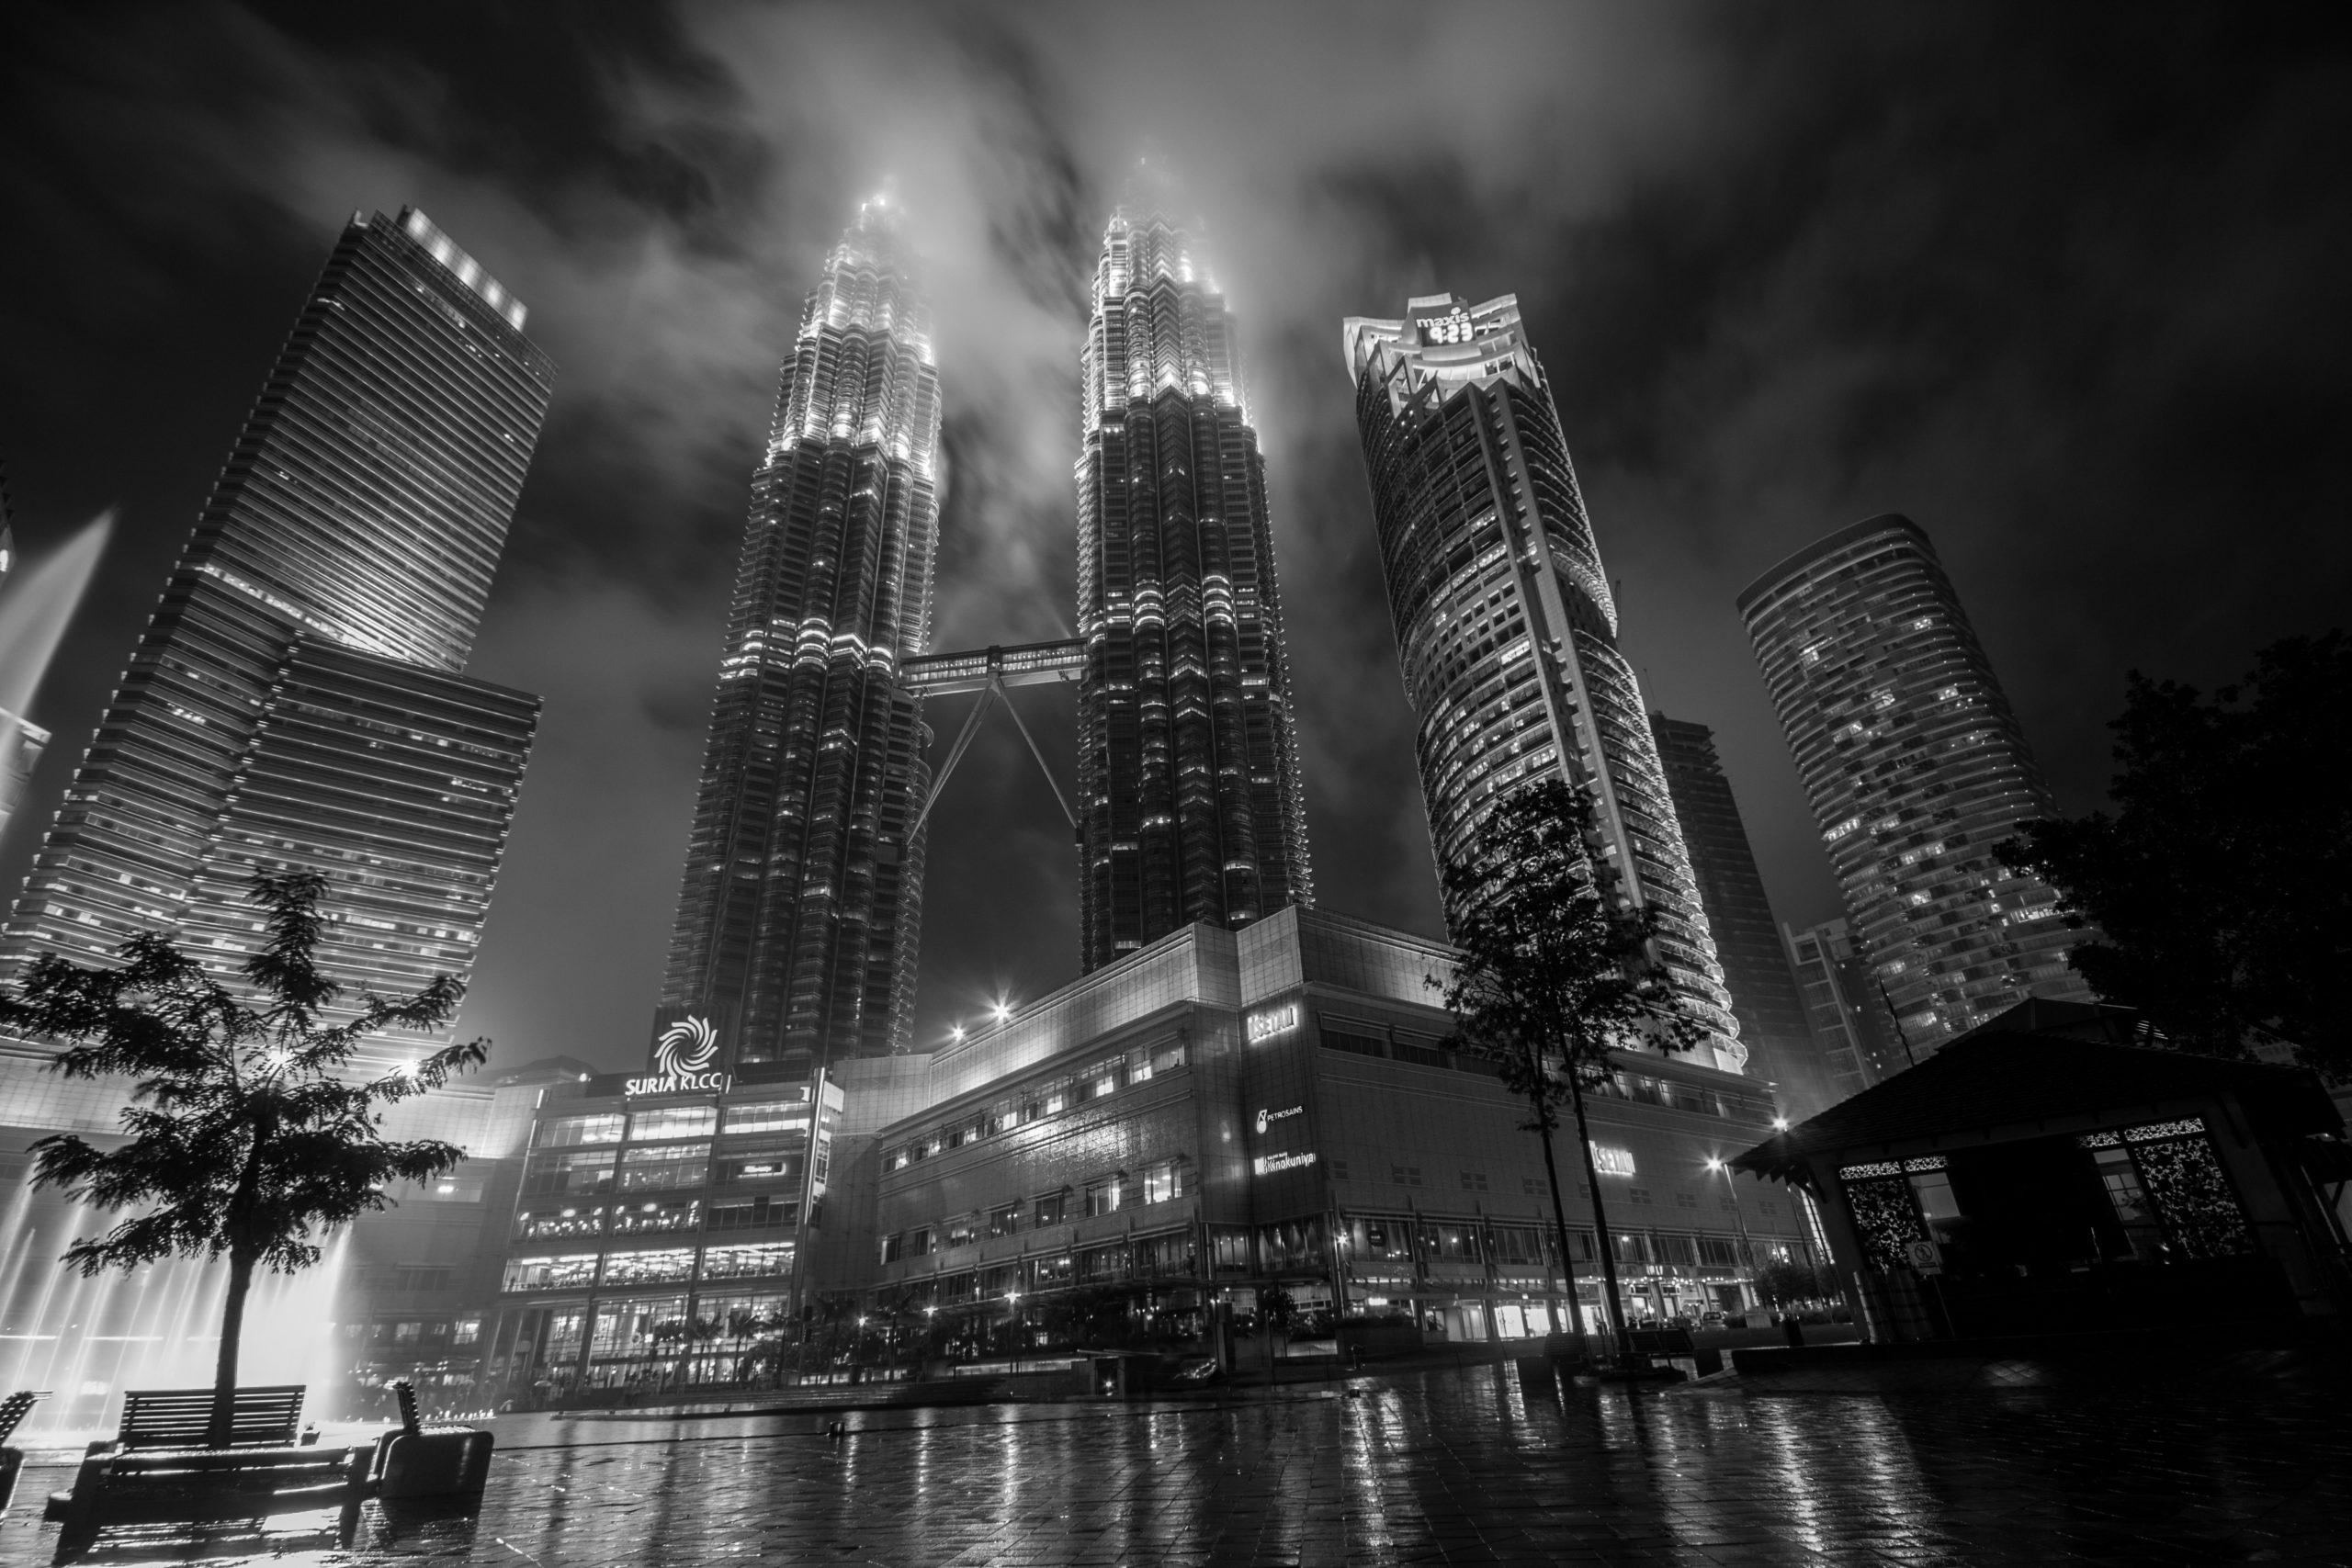 Tours jumelles Petronas, Kuala Lumpur, Malaise